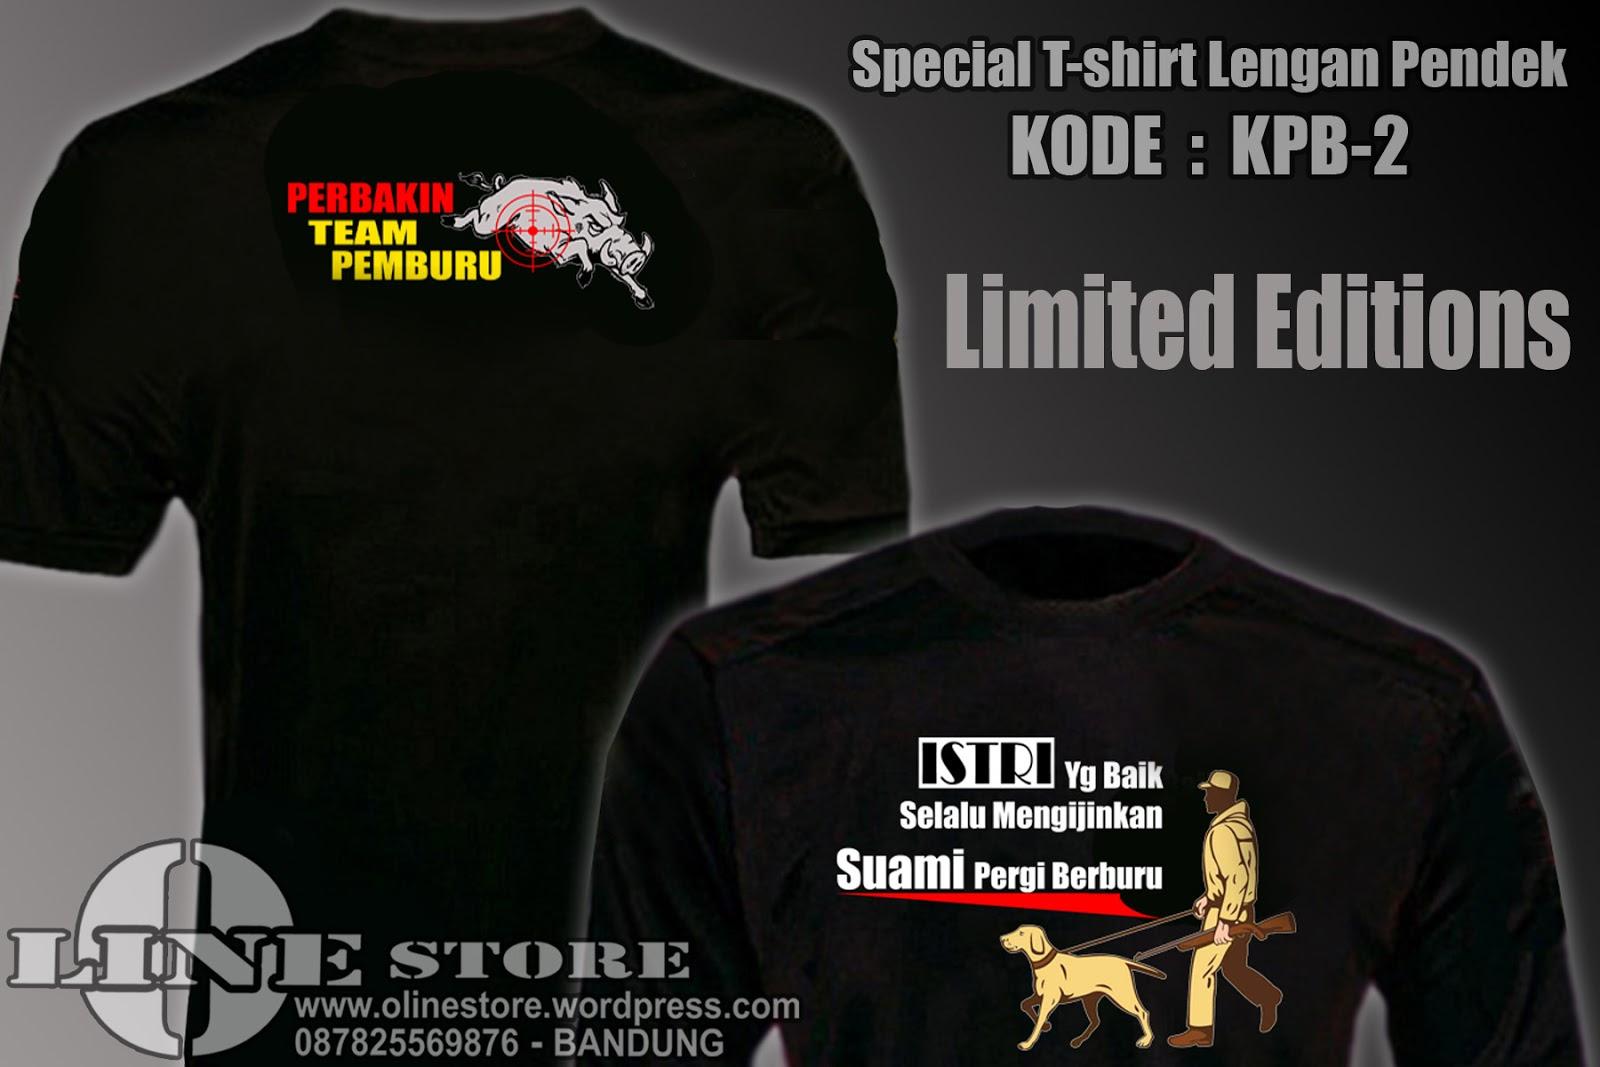 Olinestore Kaos Polo Perbakin Shirt Ready Stock Kode Kpb 2lengan Pendek Istri Yg